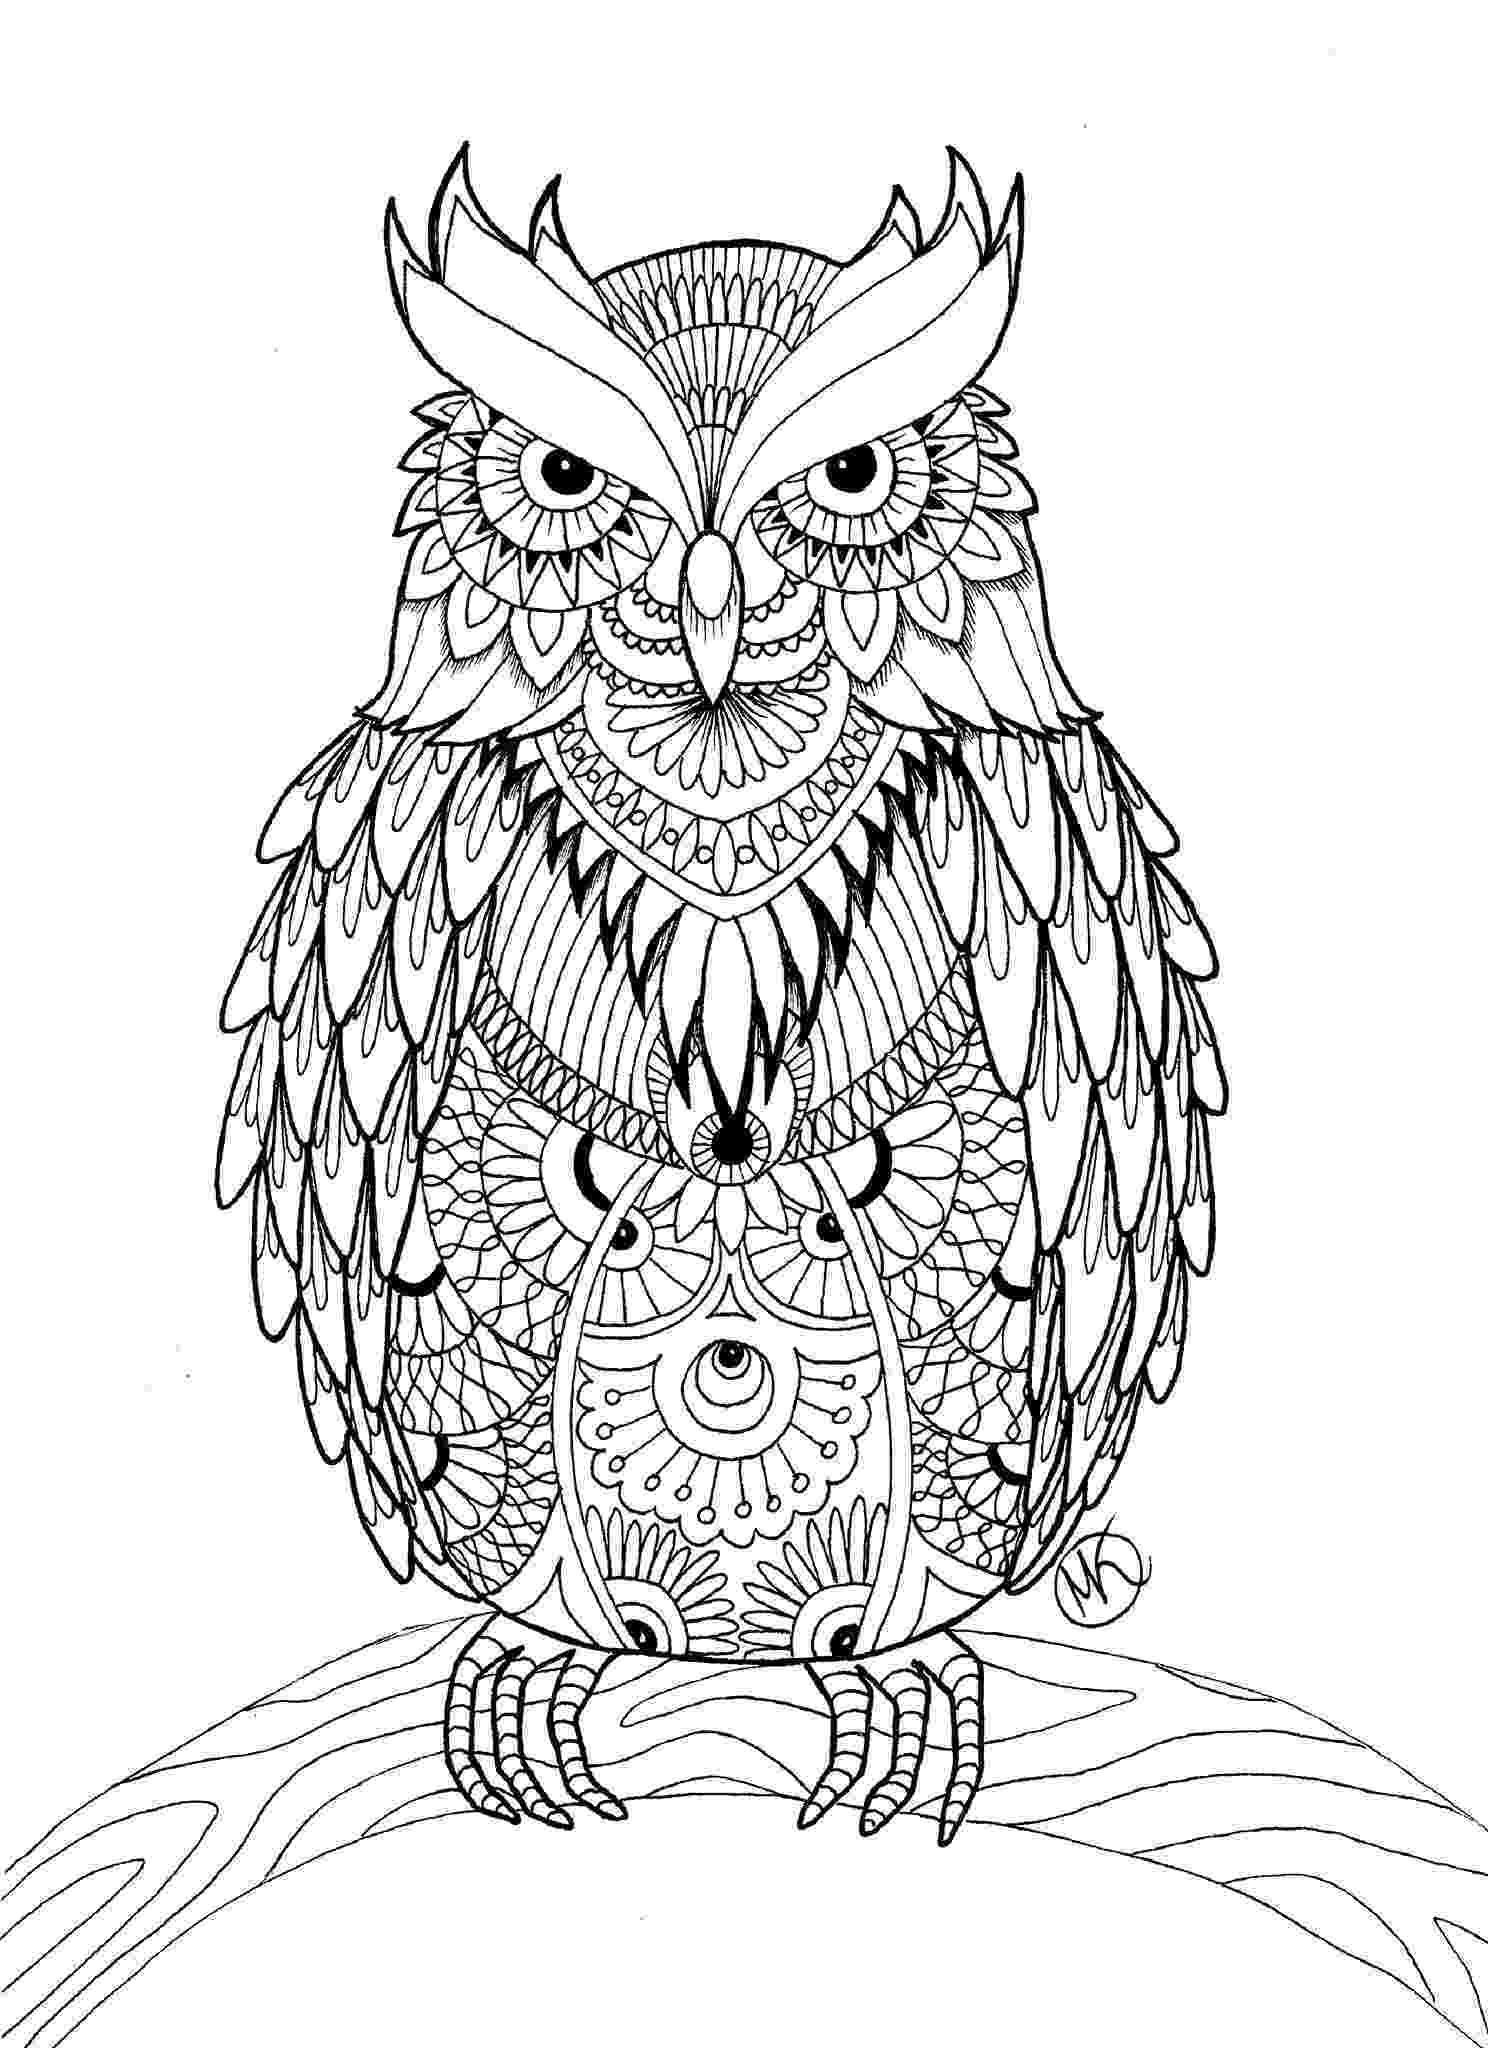 printable owl colouring cartoon owl coloring page free printable coloring pages owl colouring printable